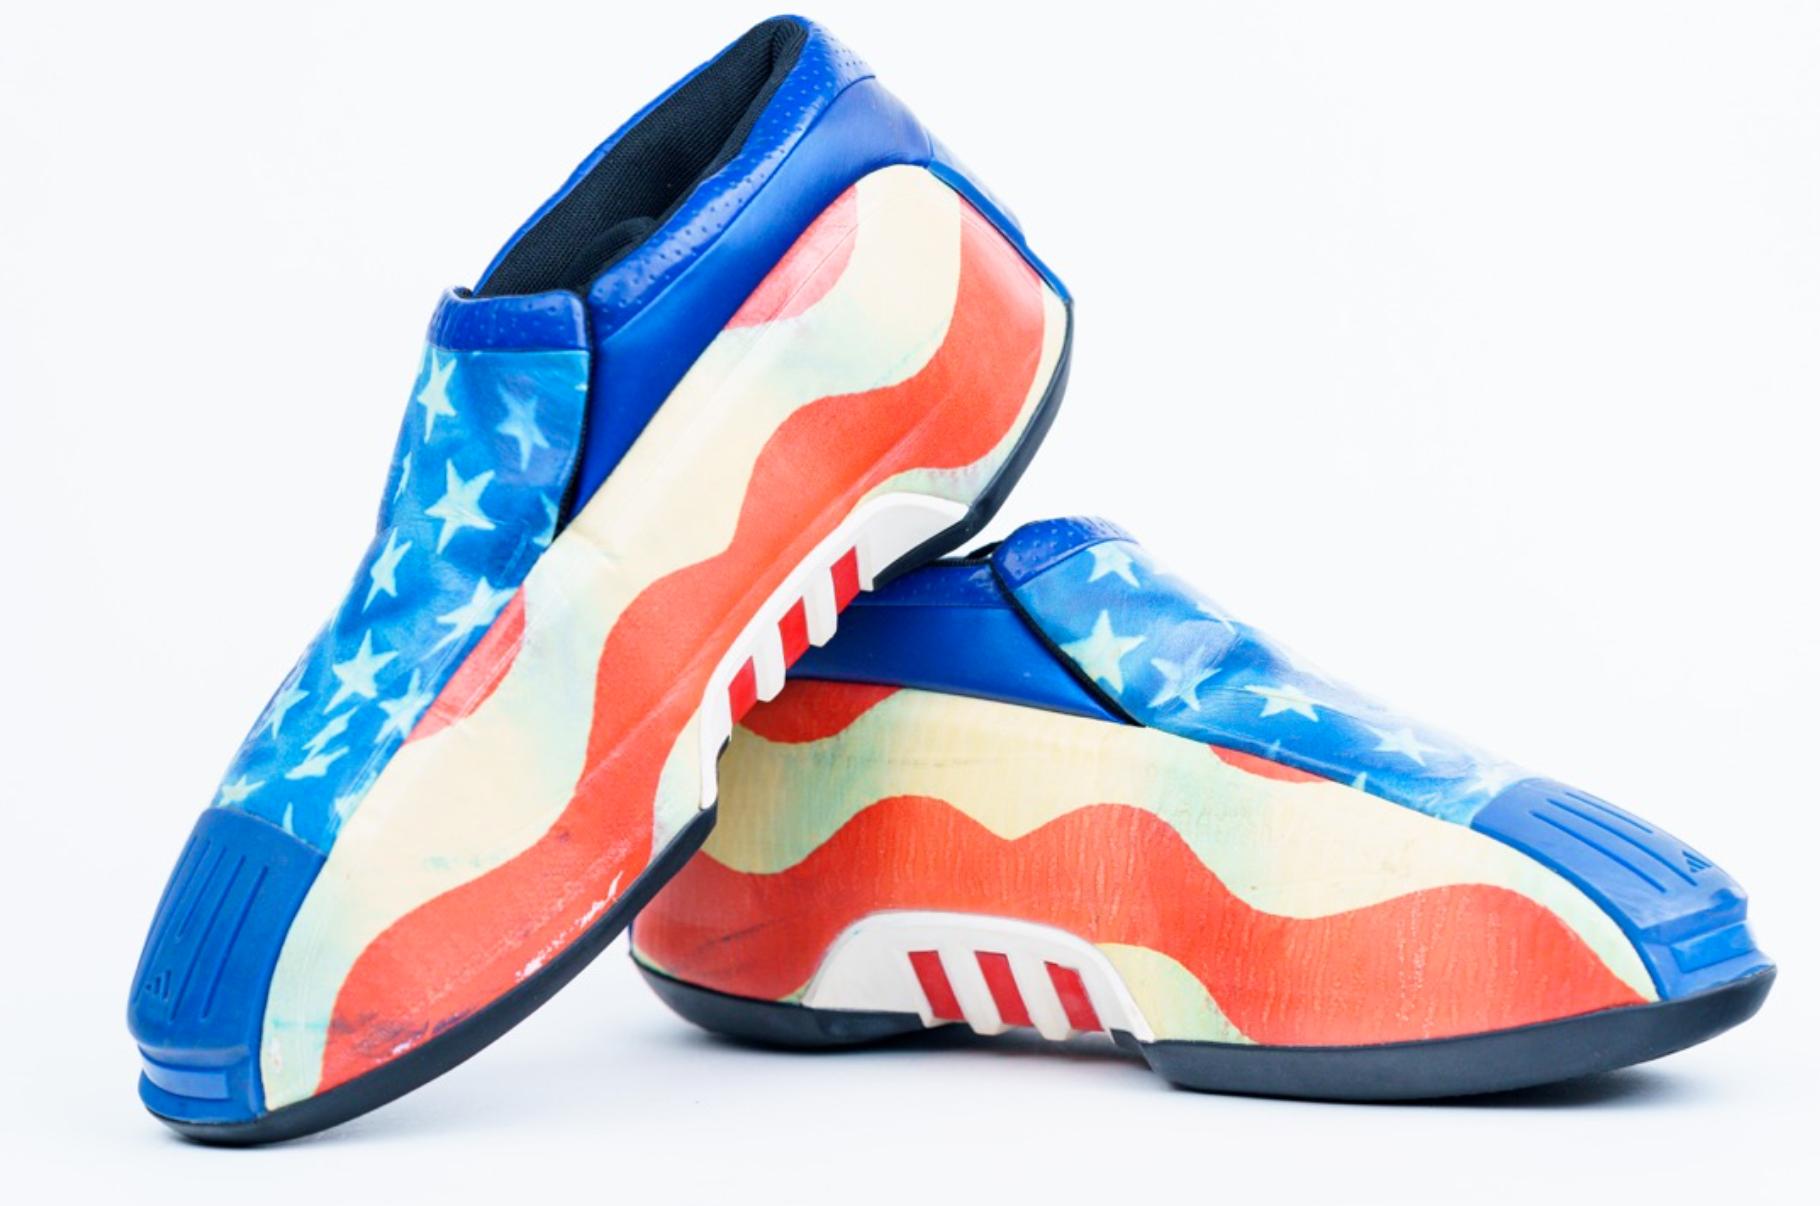 2002 LeBron James High School Sneakers (Gifted by Kobe)